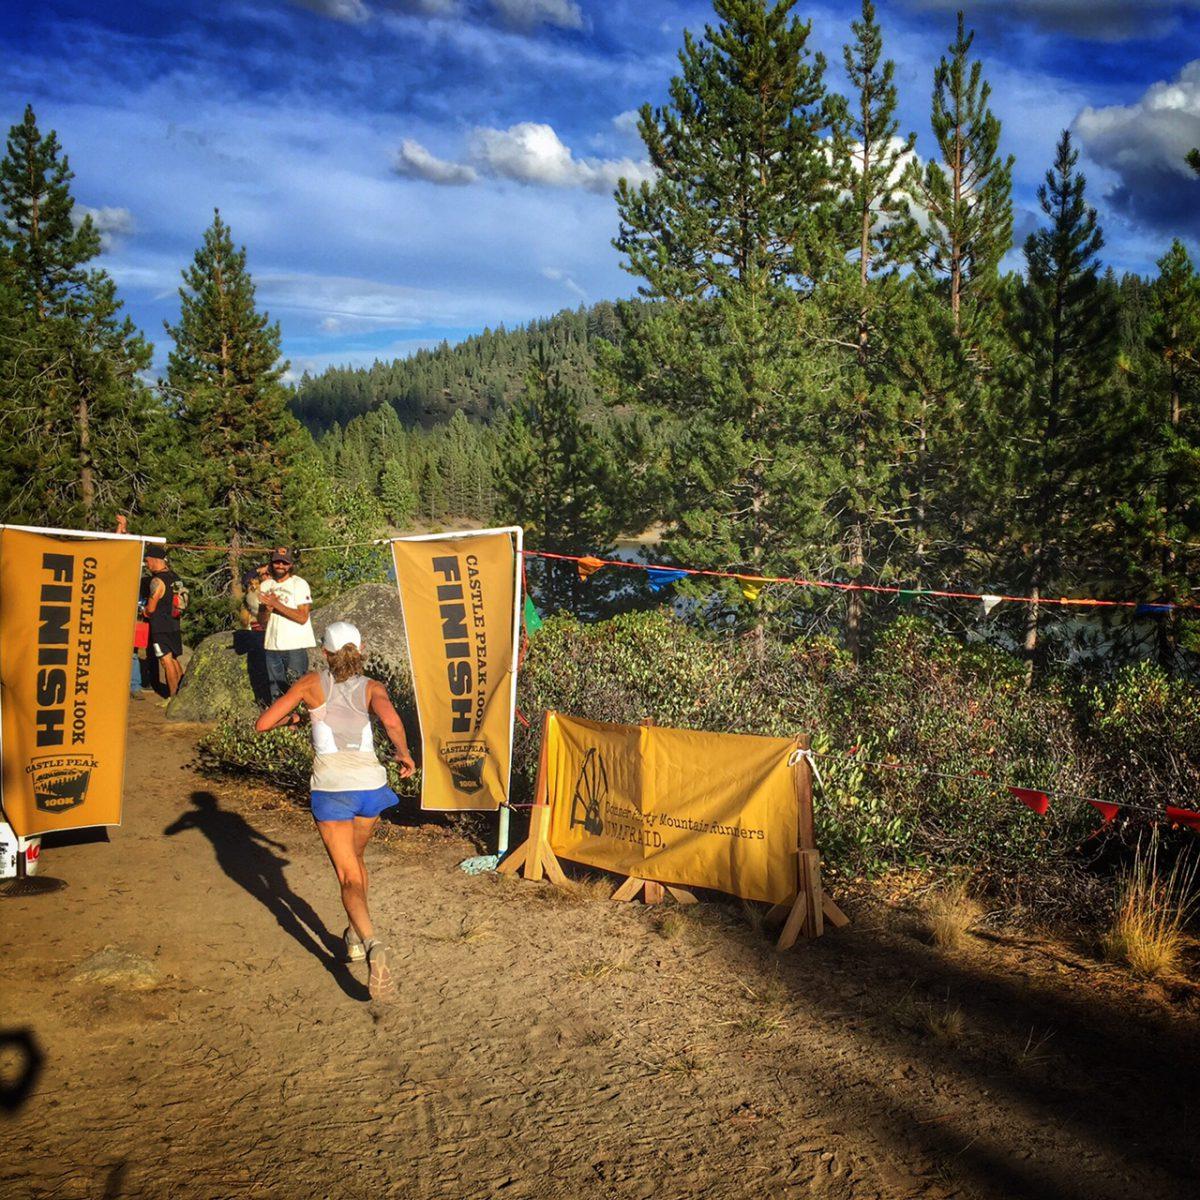 Roxanne Woodhouse (1st female) crosses the finish line. (Photo: Jenelle Potvin)